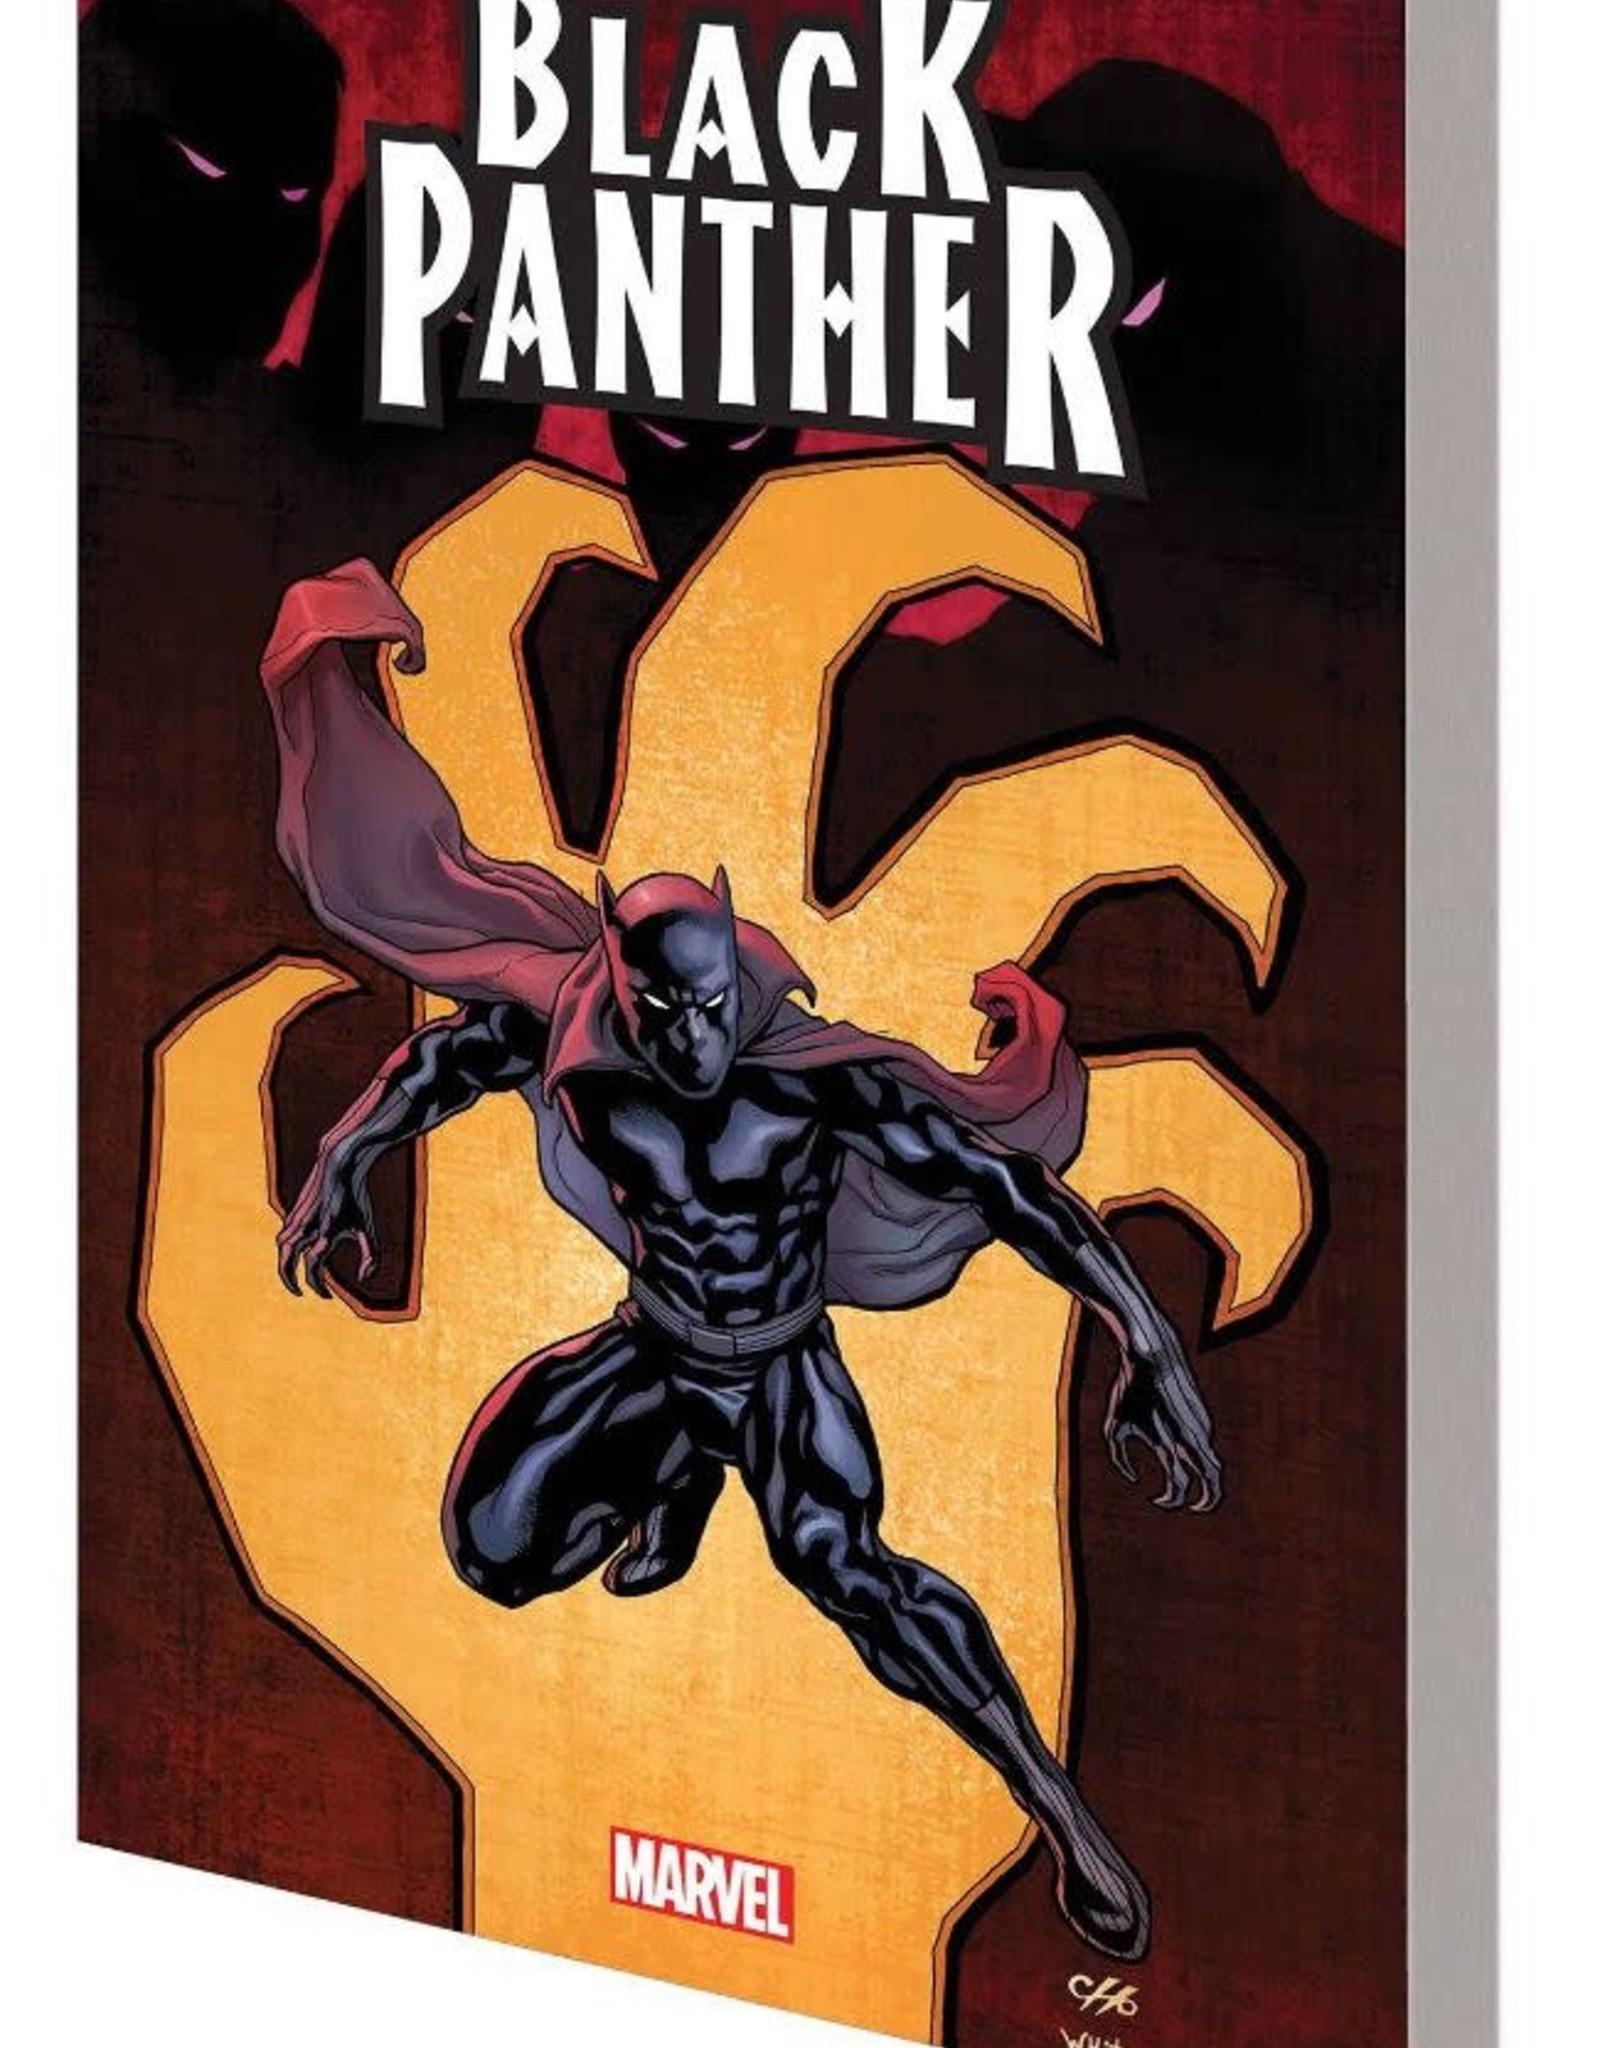 Marvel Comics Black Panther Complete Collection by Reginald Hudlin Vol 01 TP